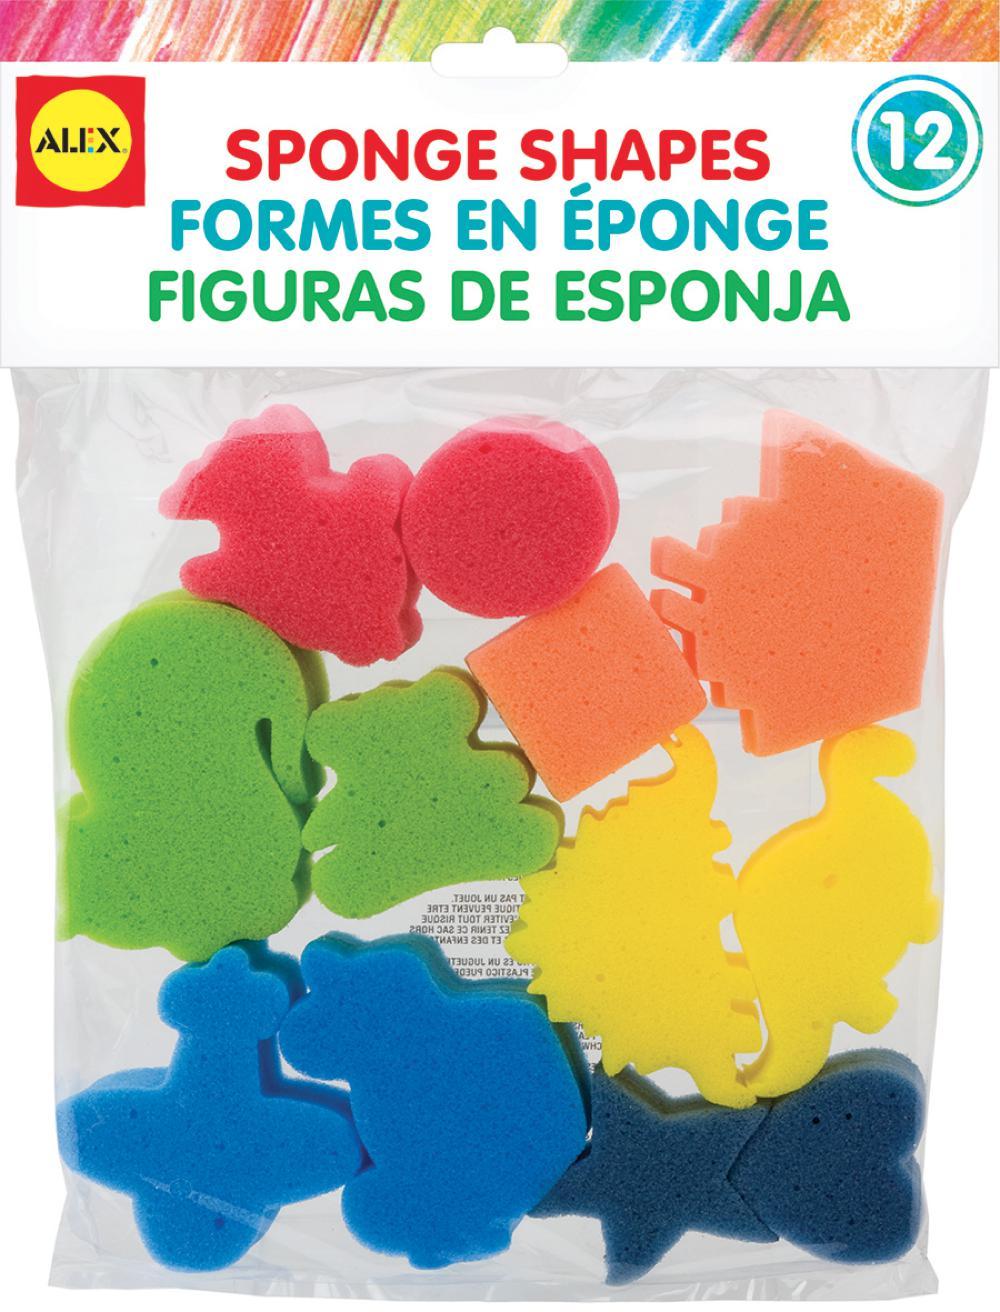 Alex - 12 Sponge Shapes English version